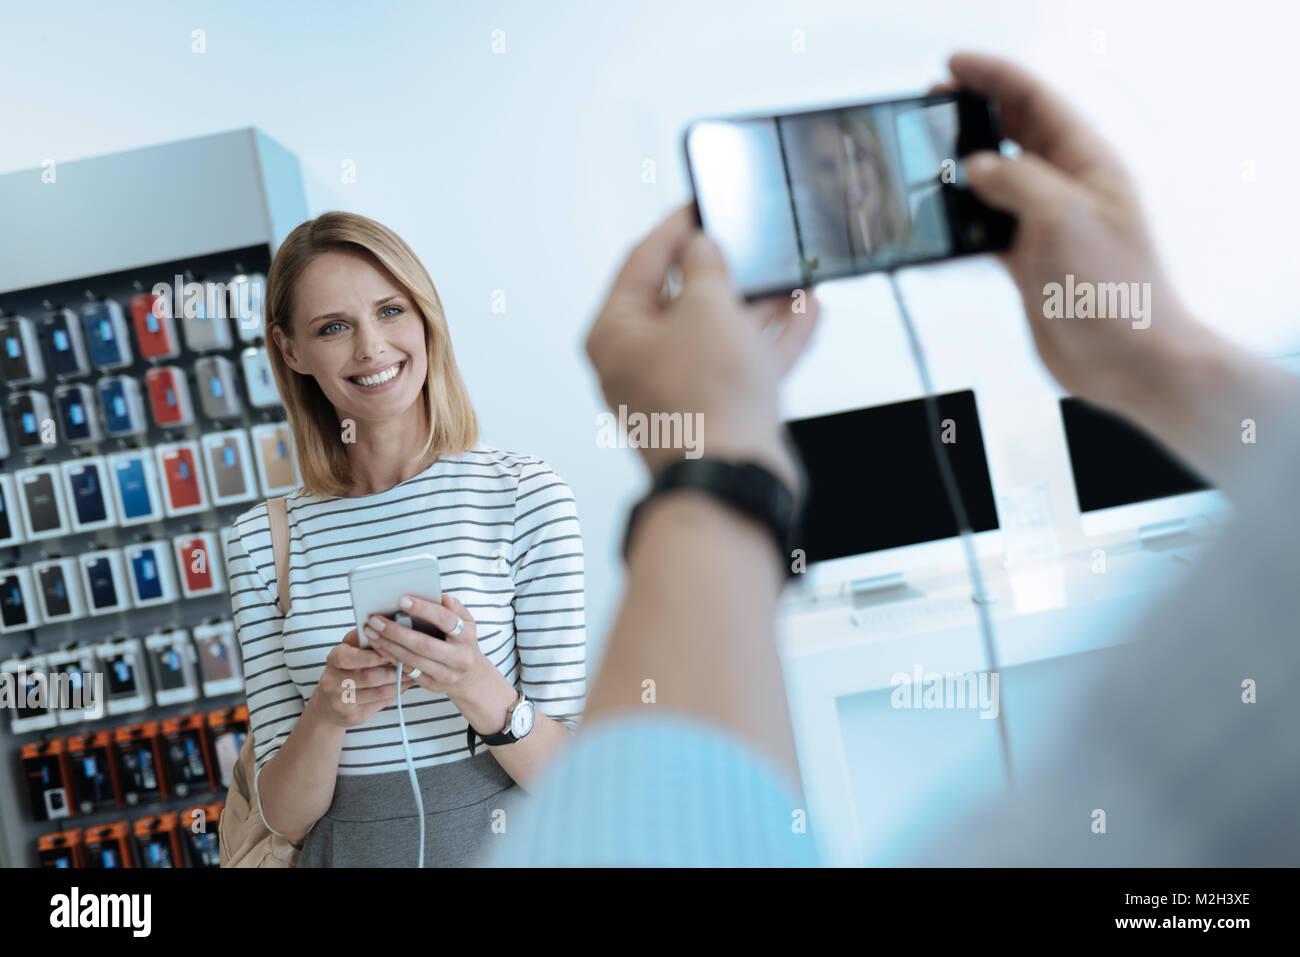 Amazing blonde demonstrating her smile - Stock Image